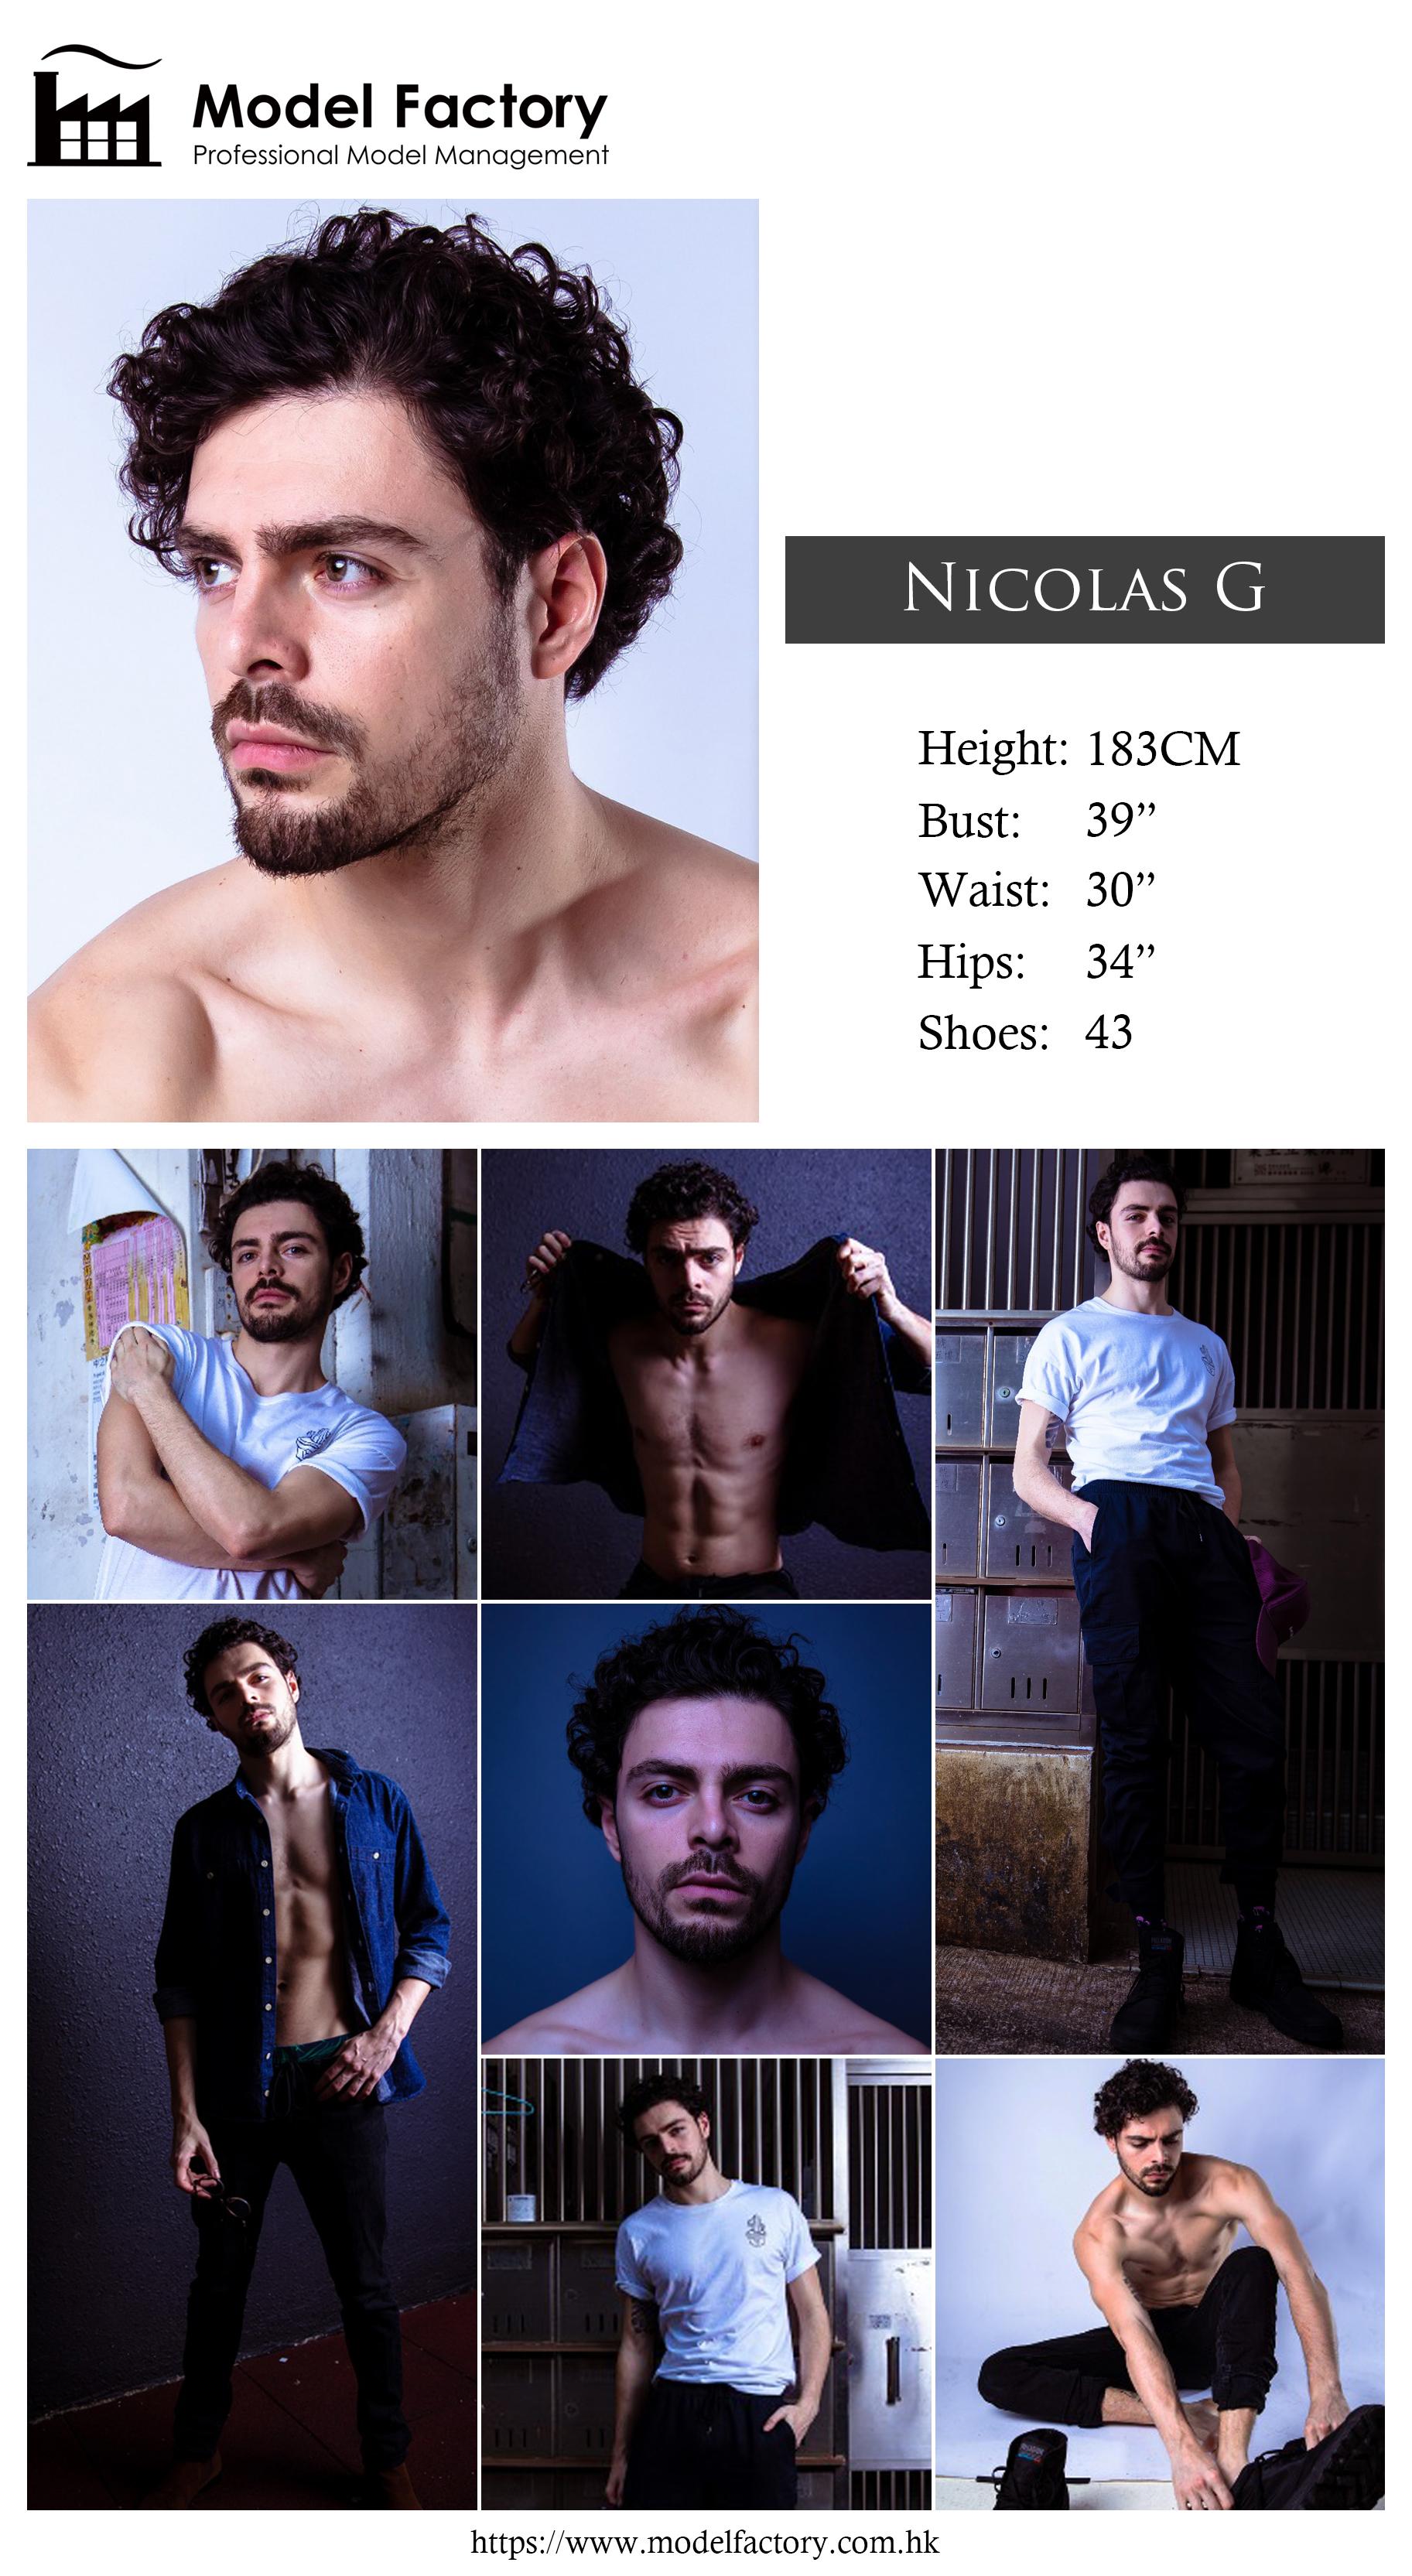 Model Factory Caucasian Male Model NicolasG